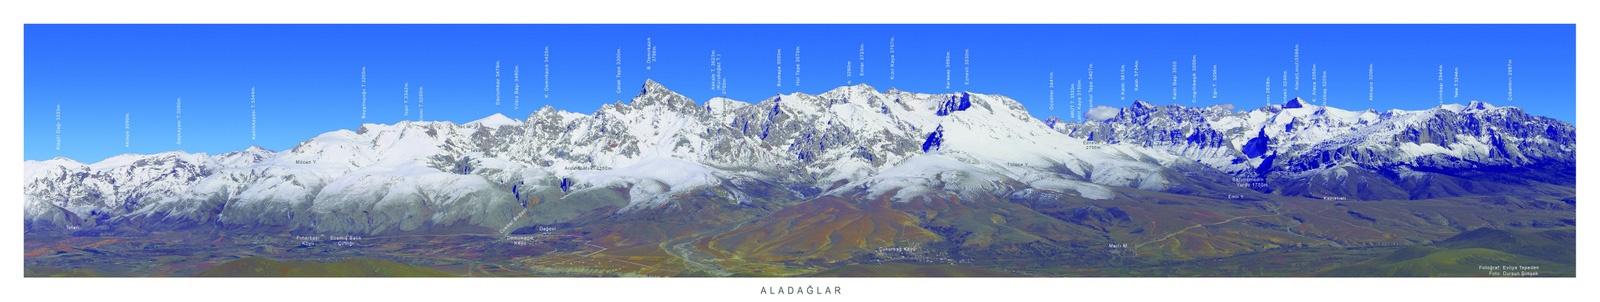 ALADA¦ŞLAR-MANZARA-2-P-1601